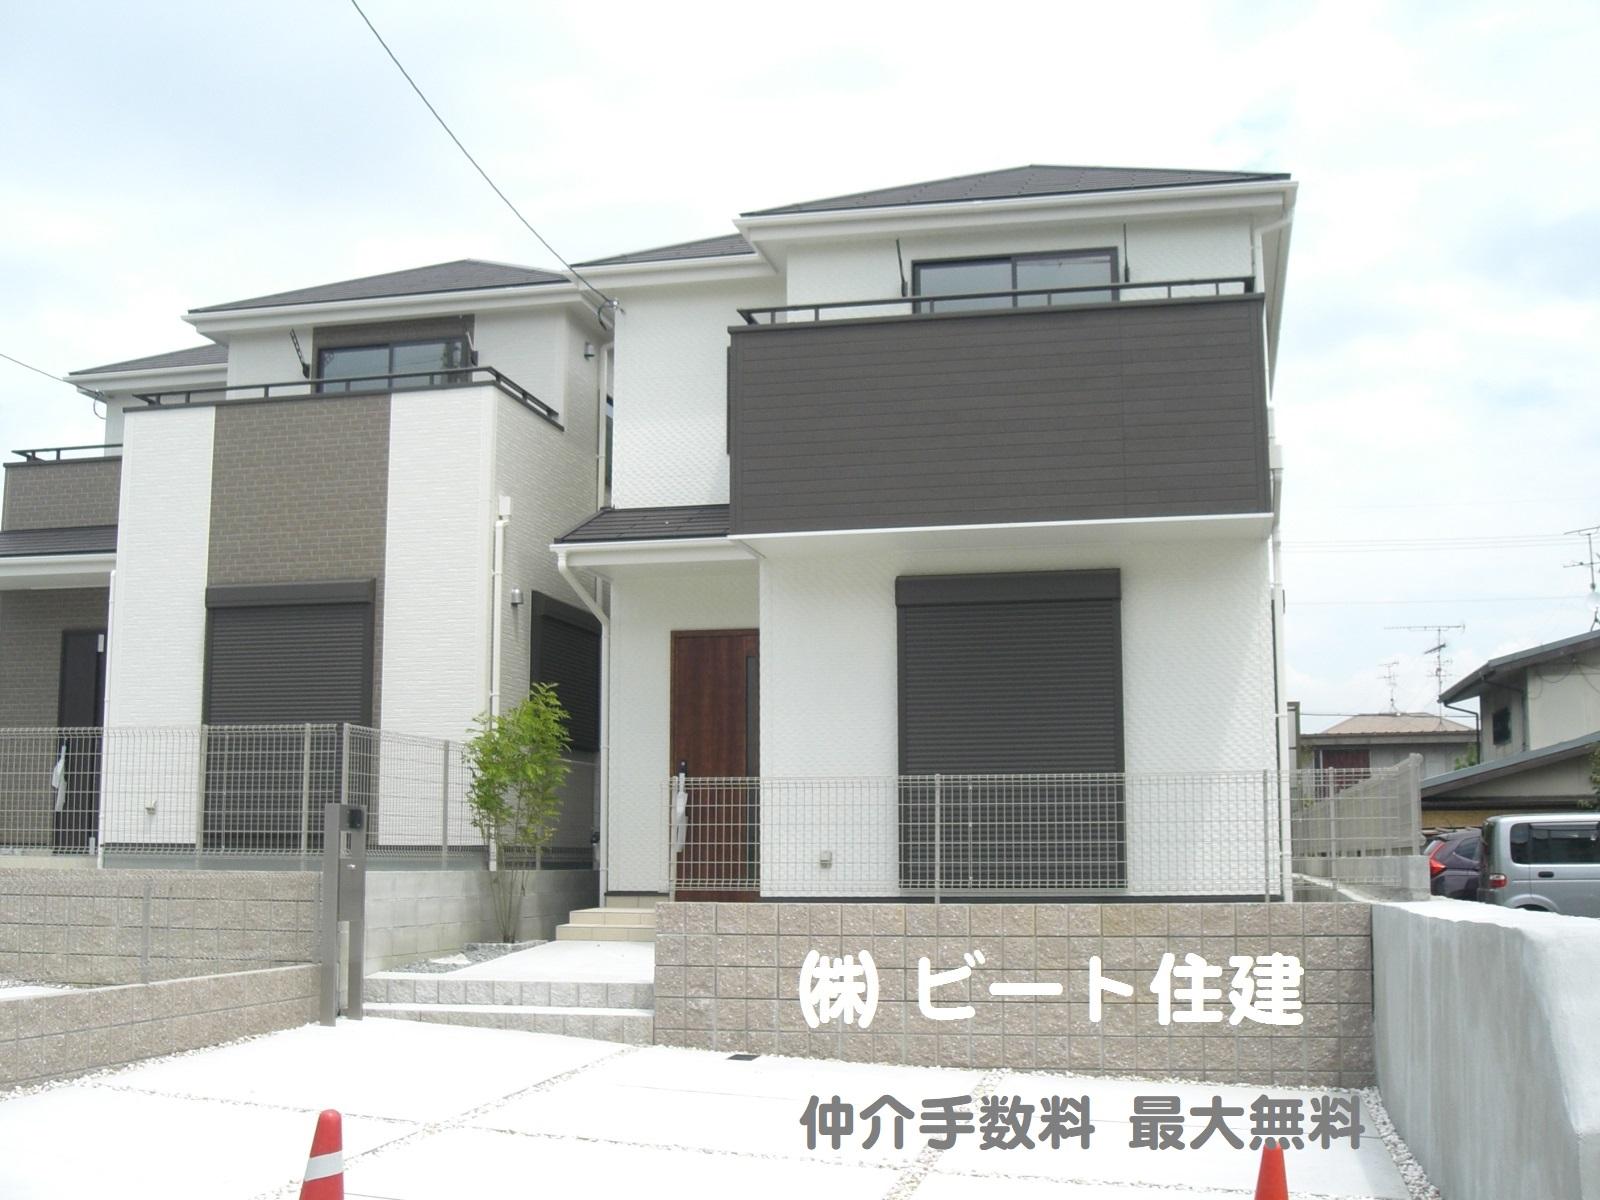 奈良県 新築 ビート住建 上牧町 お買い得 仲介手数料 最大無料